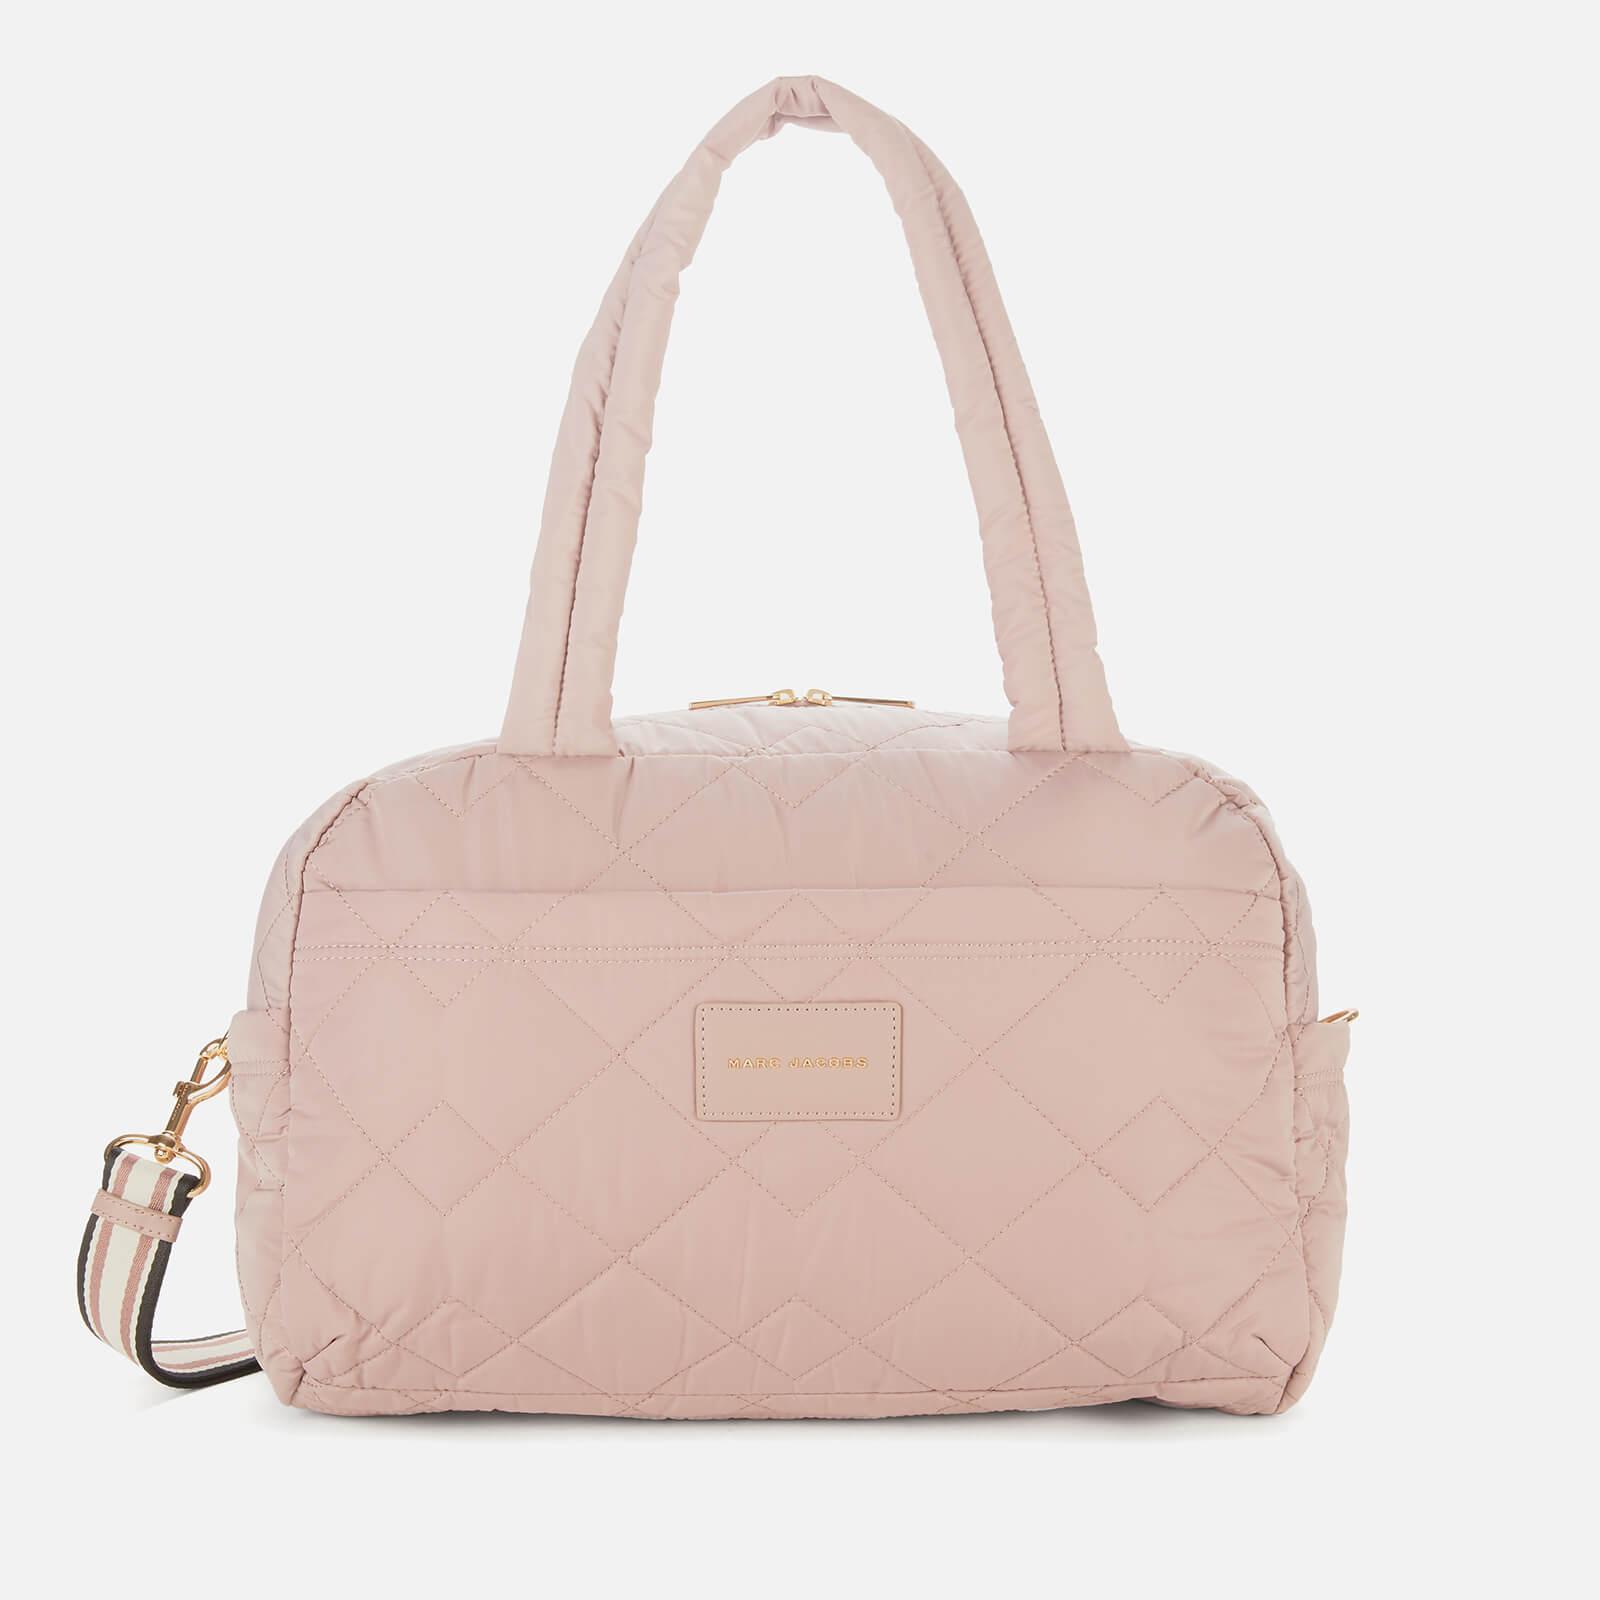 Marc Jacobs Women's Essentials Medium Weekender Bag - Bark